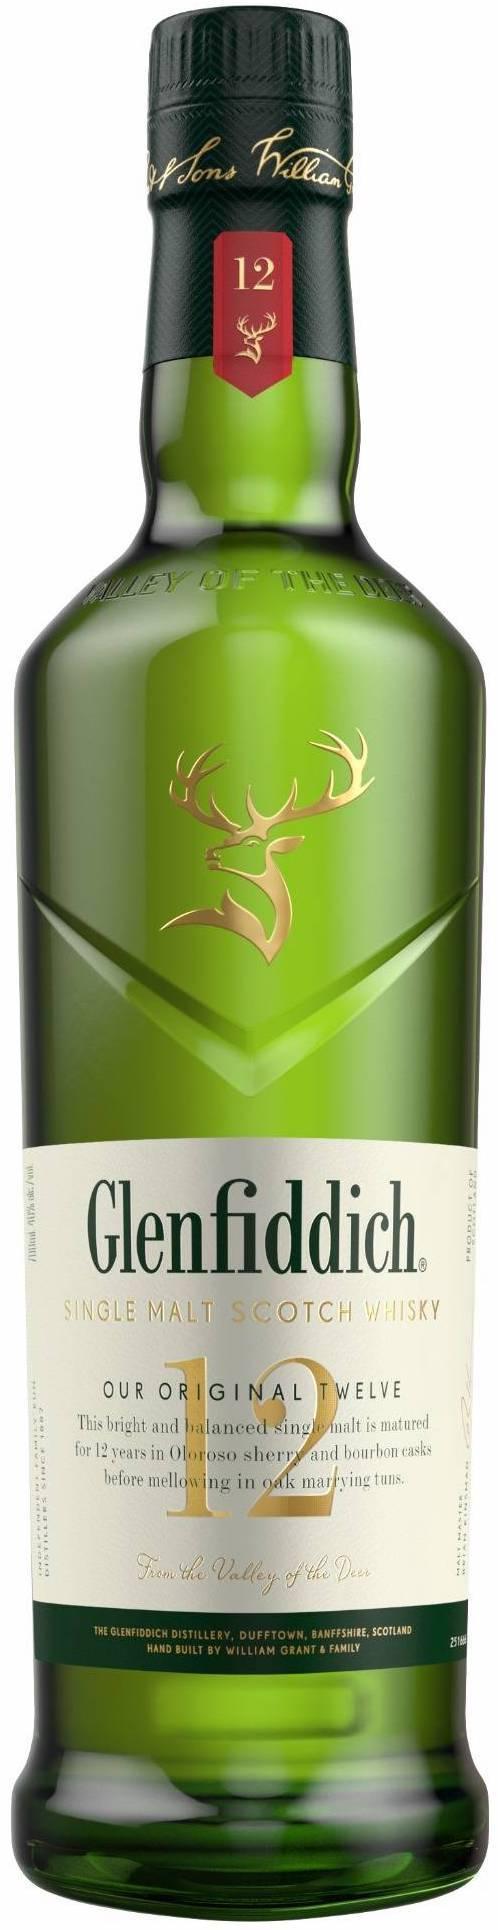 Glenfiddich Single Malt Scotch Whisky 12 year old